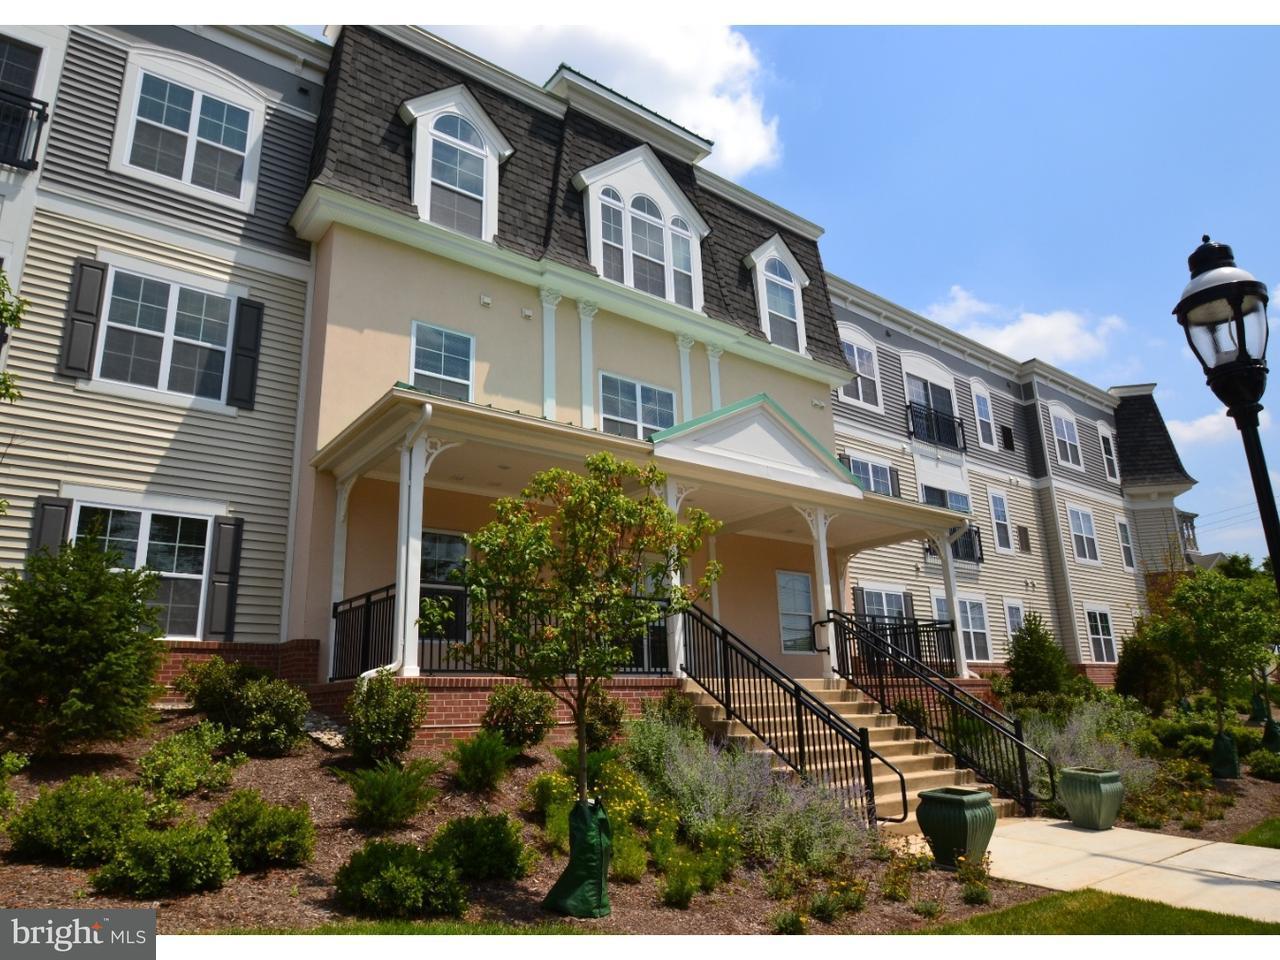 独户住宅 为 出租 在 131 N MAIN ST #8 Chalfont, 宾夕法尼亚州 18914 美国